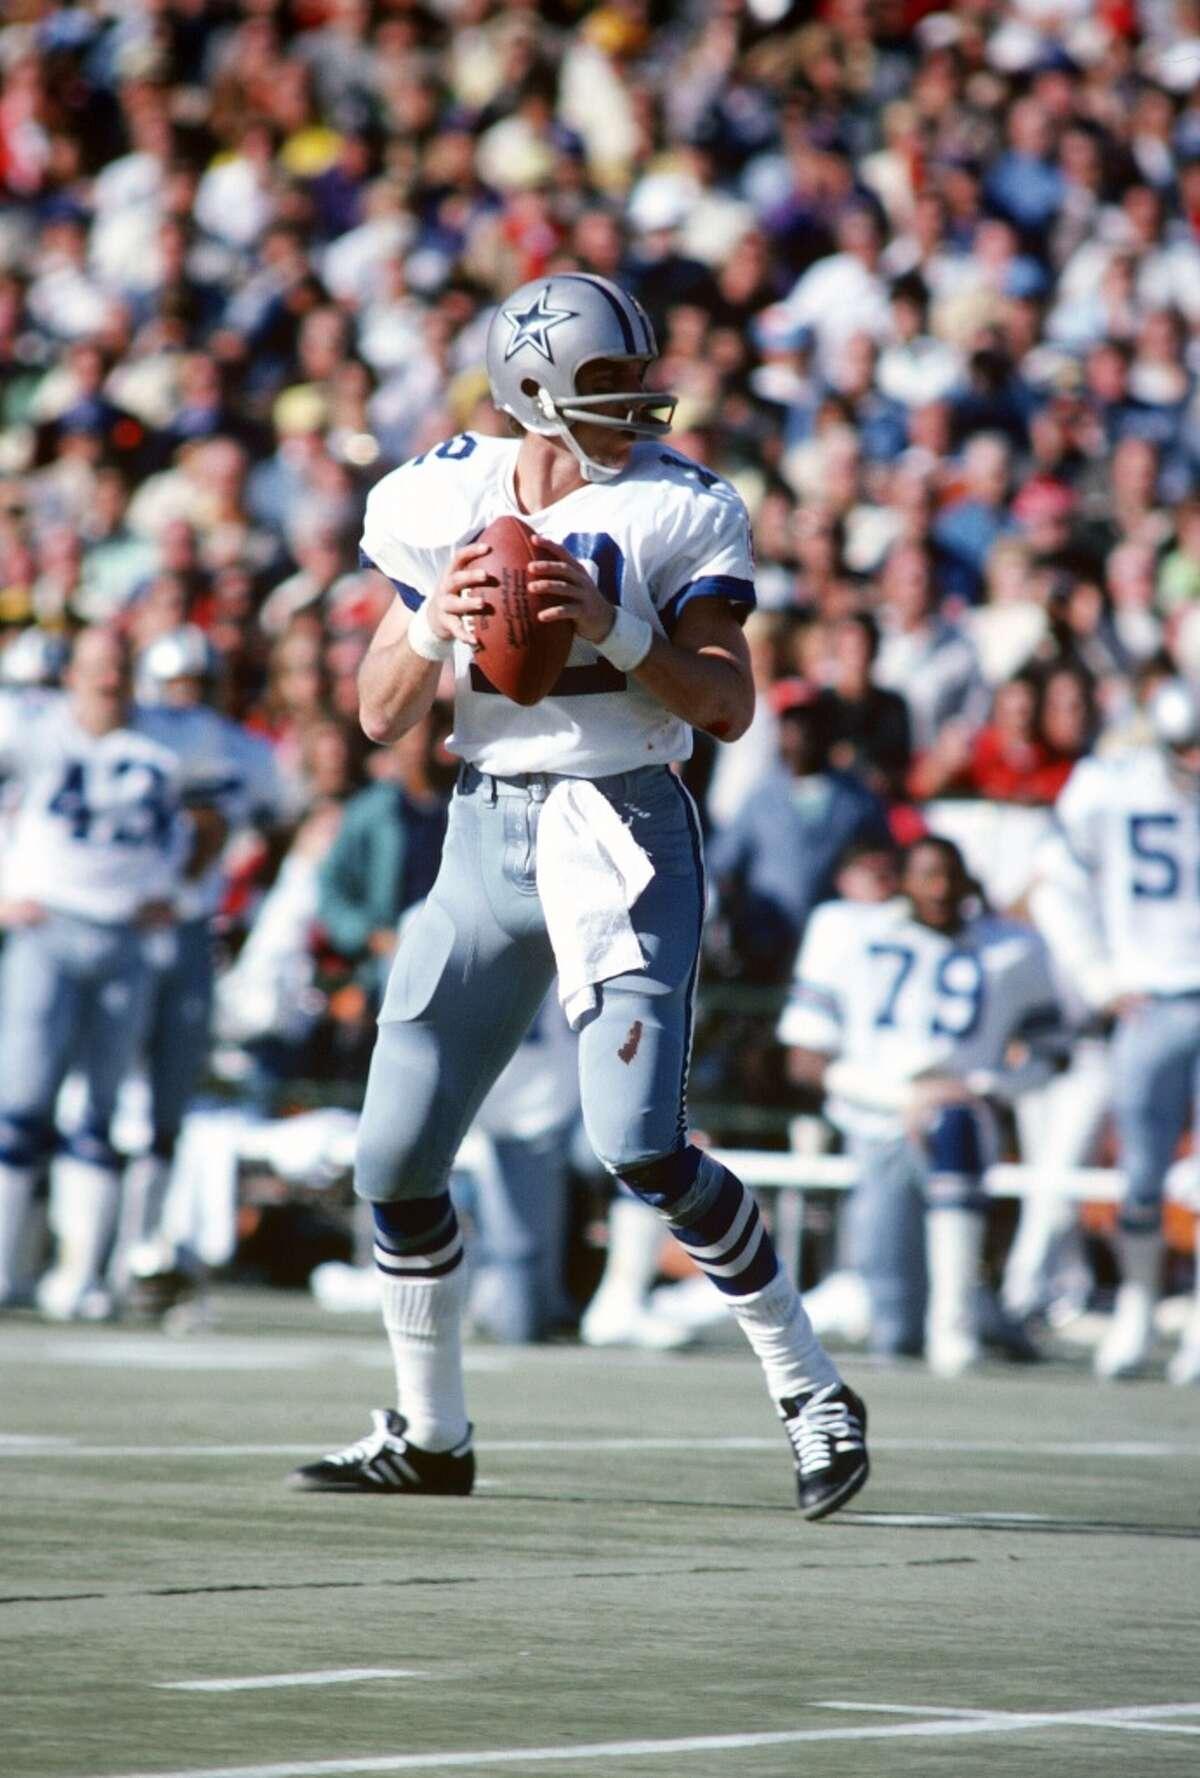 Super Bowl VI Dallas Cowboys 24, Miami Dolphins 3 Jan. 16, 1972 MVP - Roger Staubach, QB, Dallas Cowboys Stats: 119 passing yards, 2 touchdowns